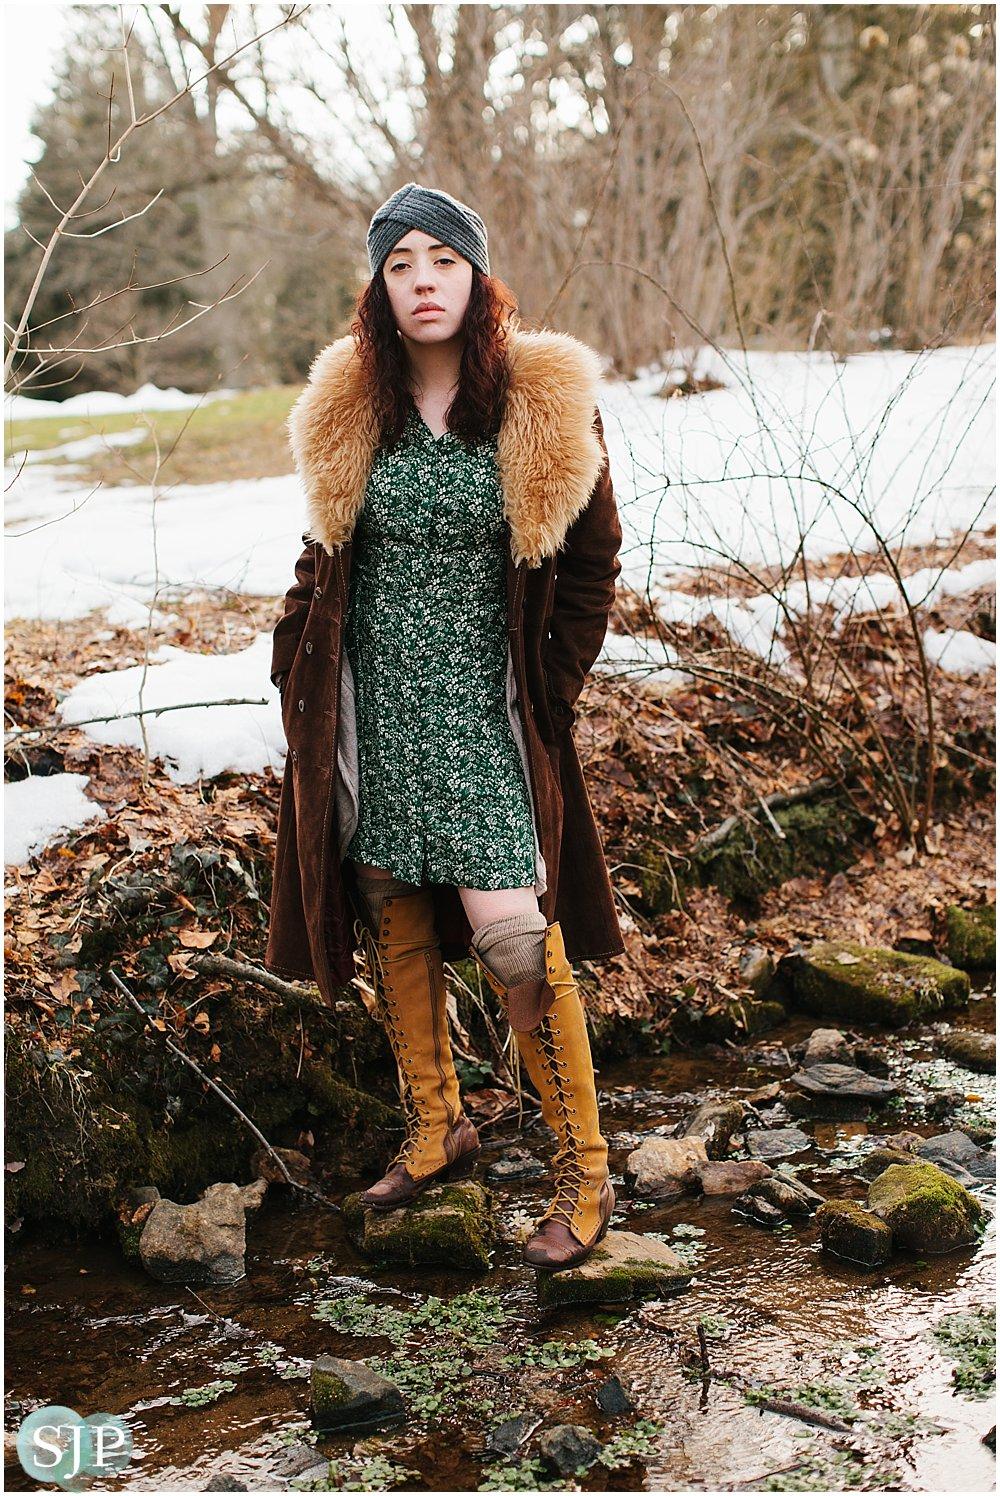 Kristen at Tyler Arboretum Media PA Portrait Photographer